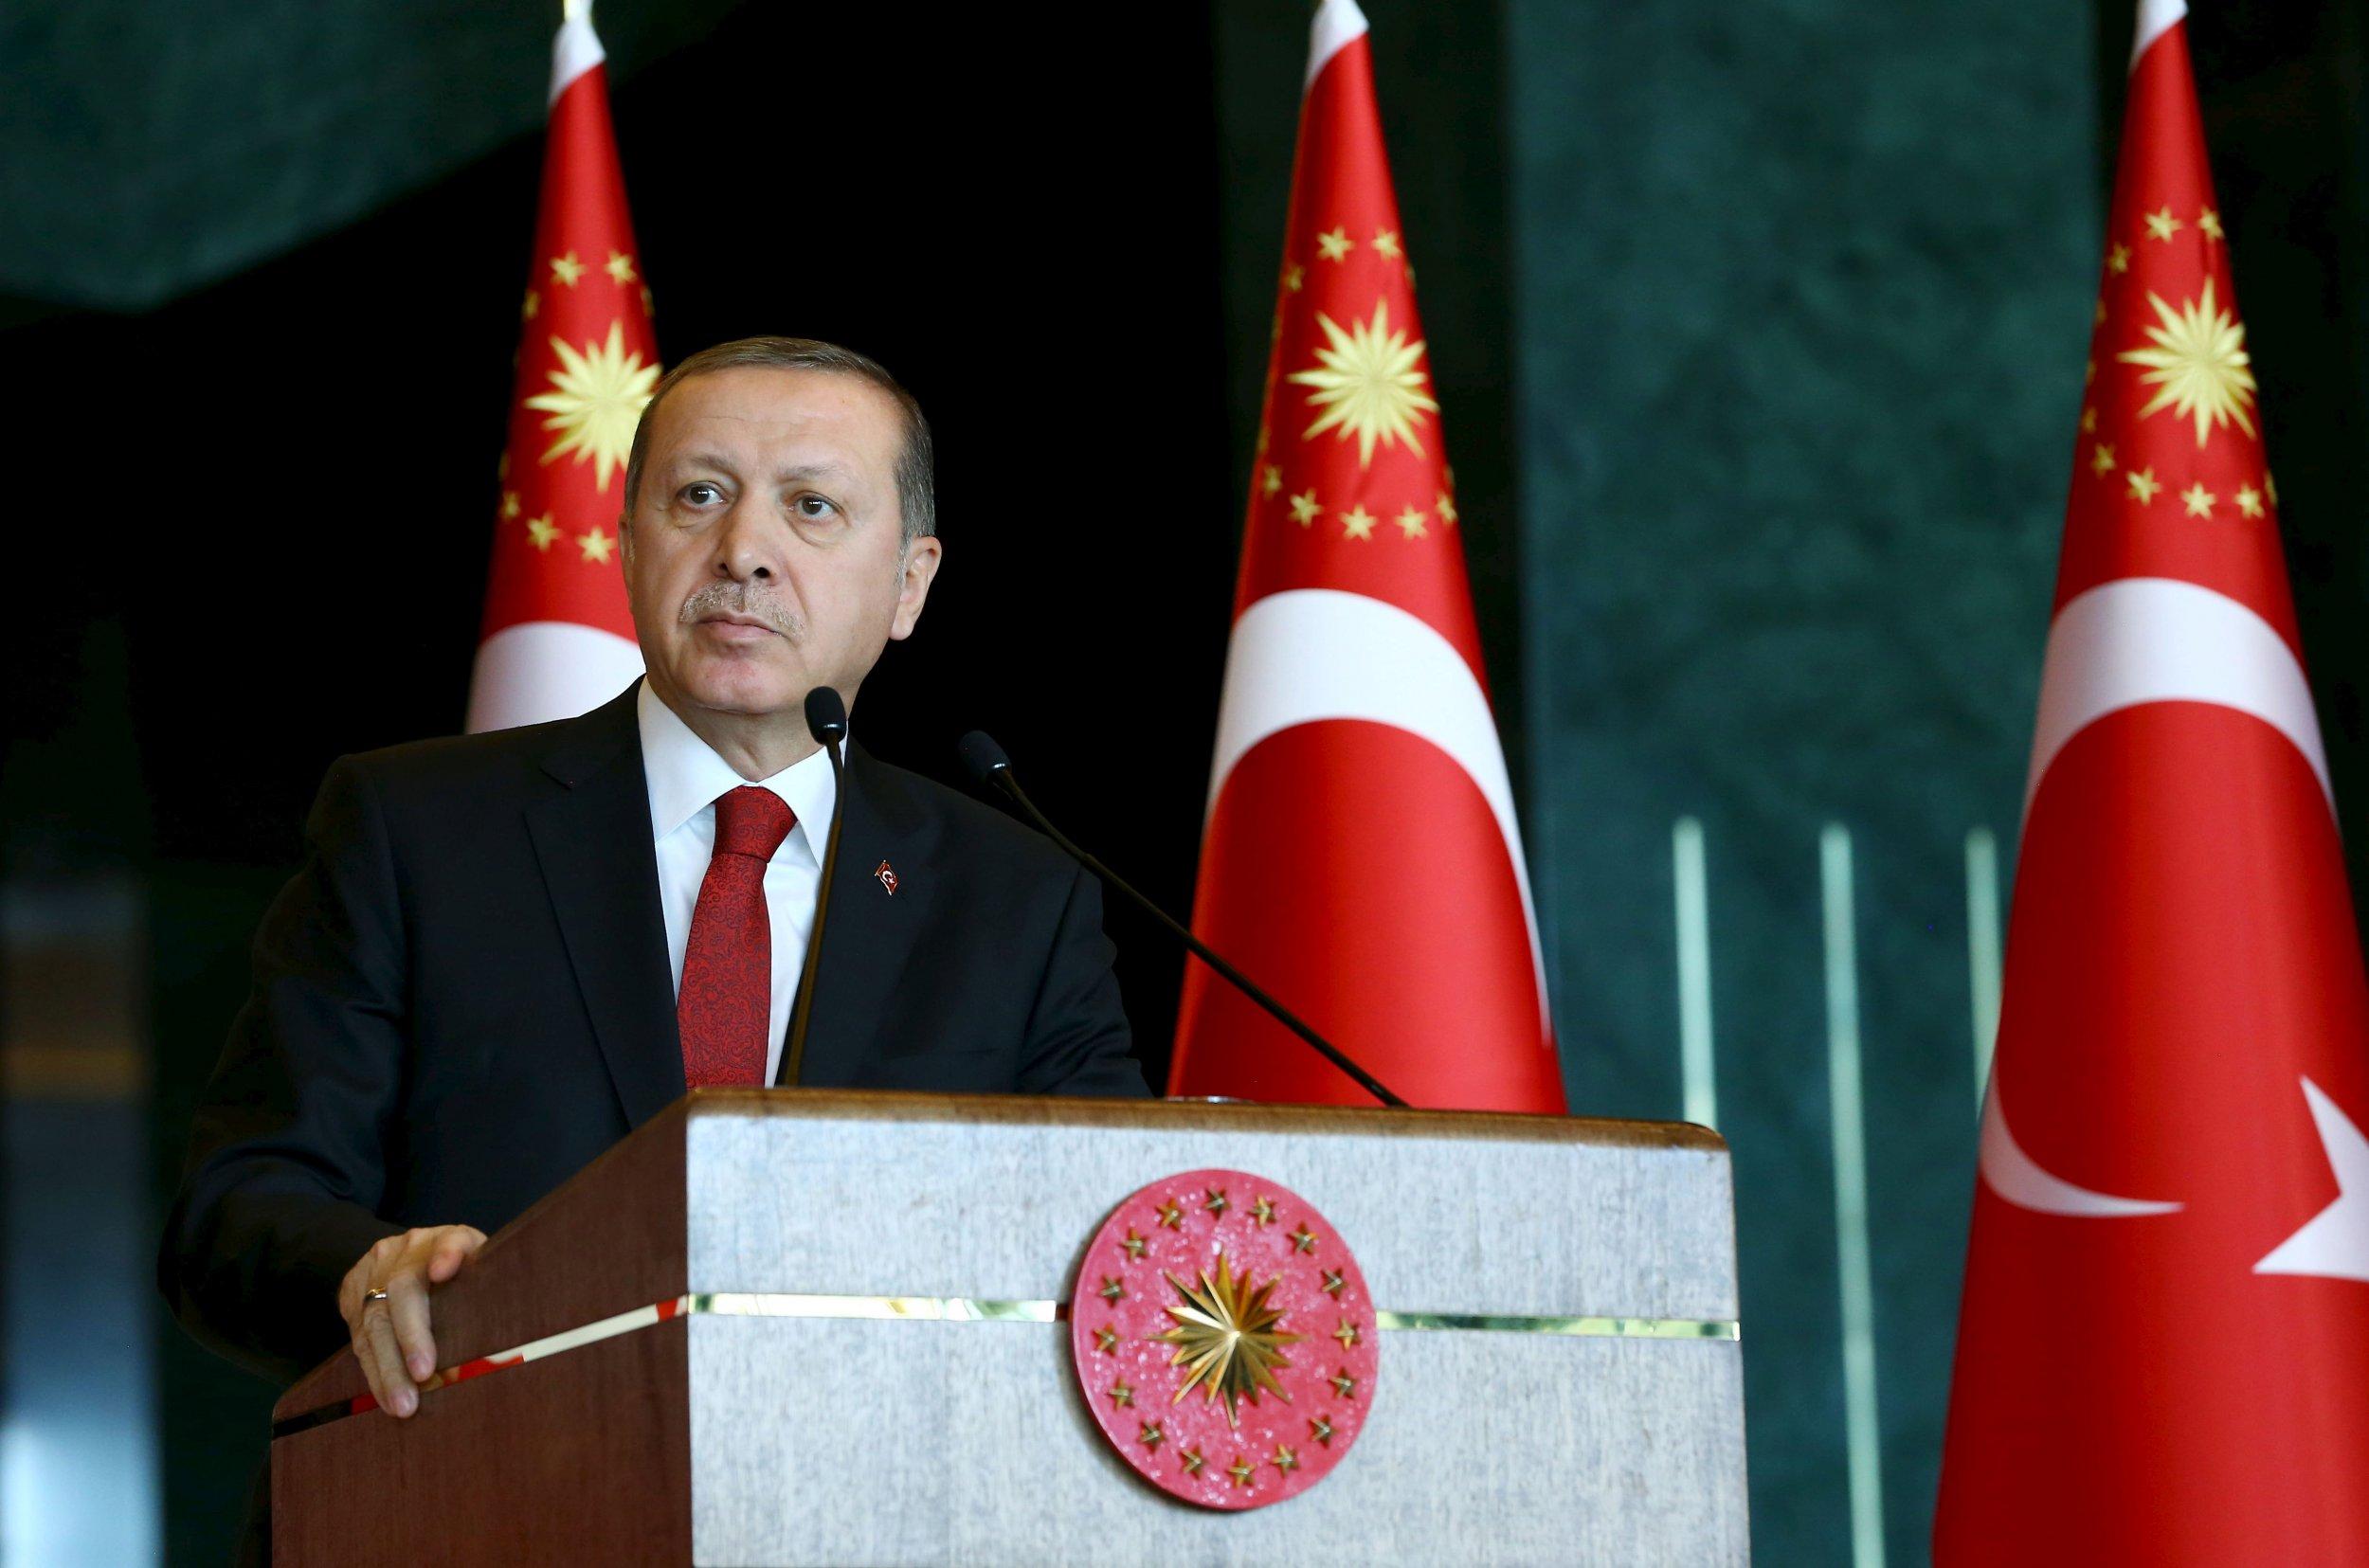 Erdogan addresses an audience in Ankara